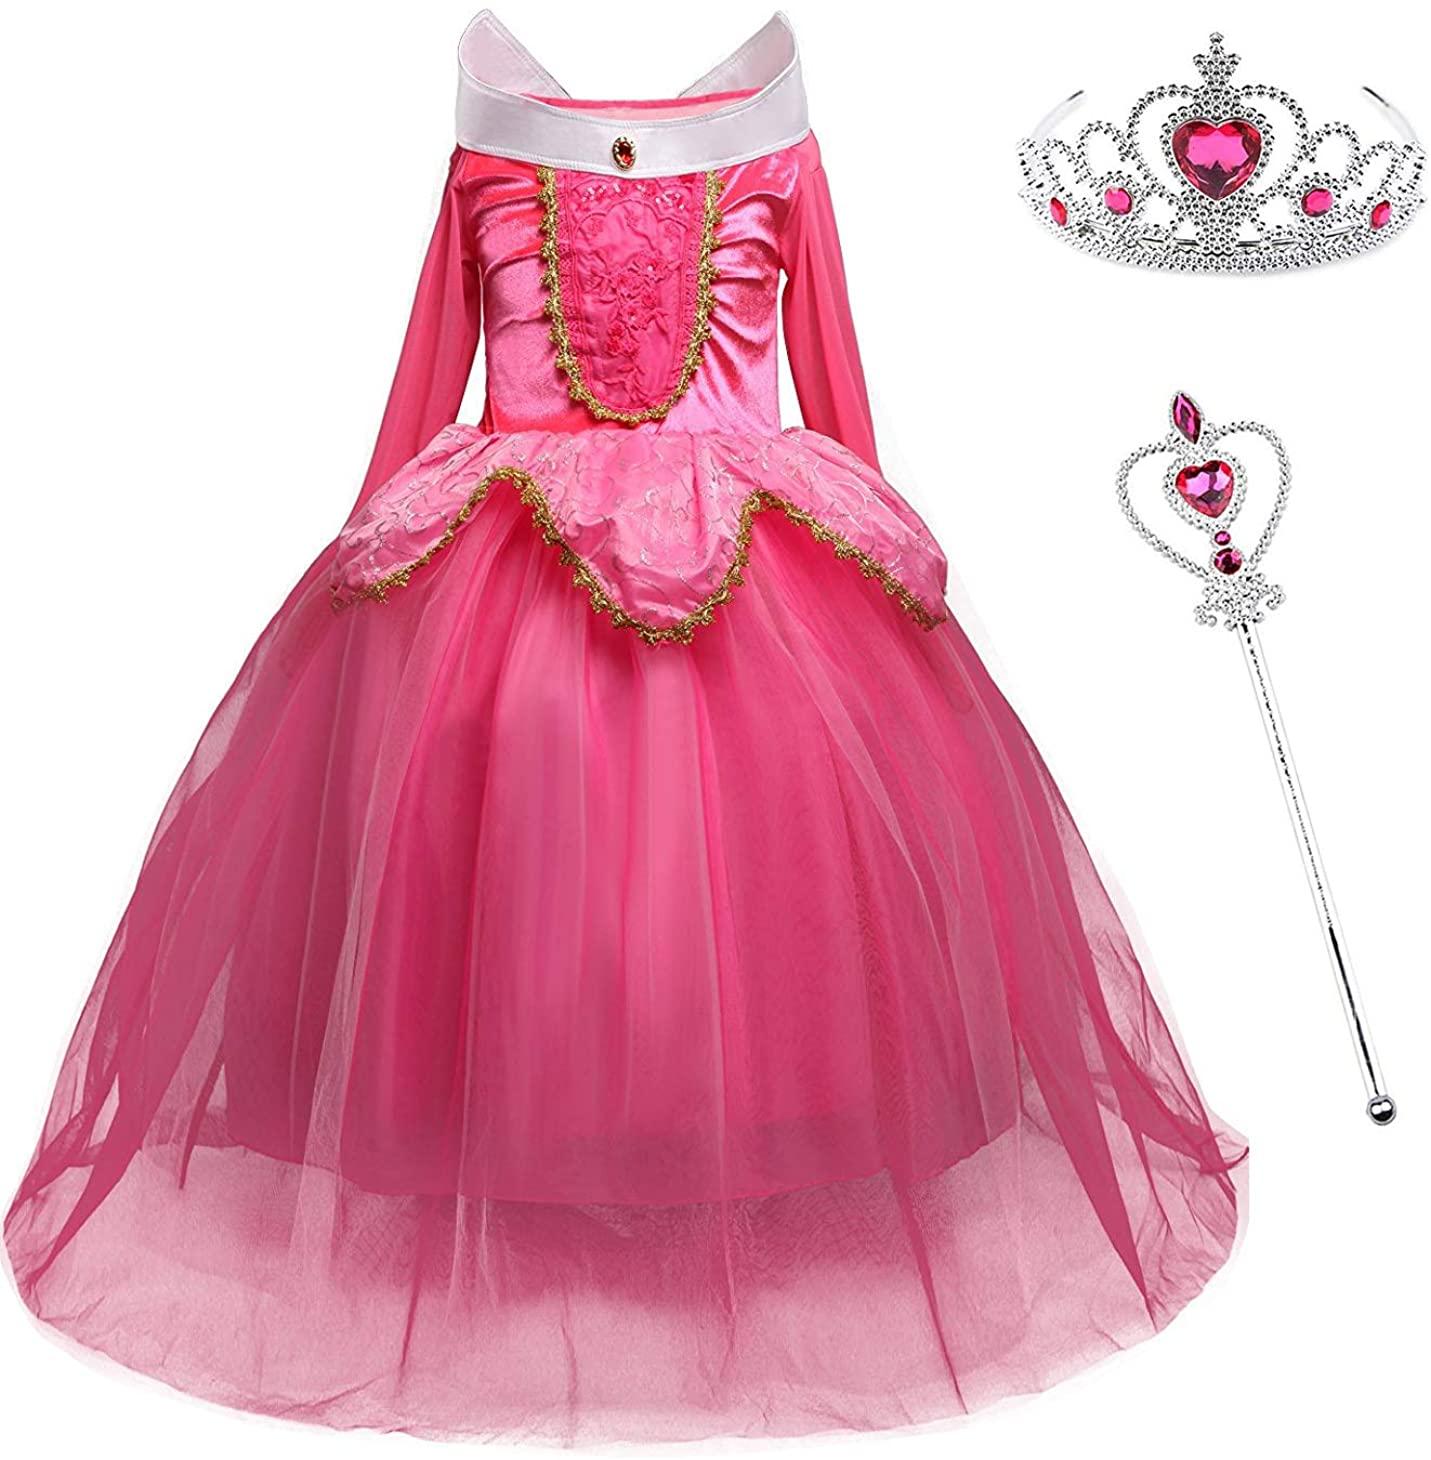 MYZLS Girls Princess Costume Sleeping Beauty Girls Fancy Party Dress Halloween Dress Up Outfit